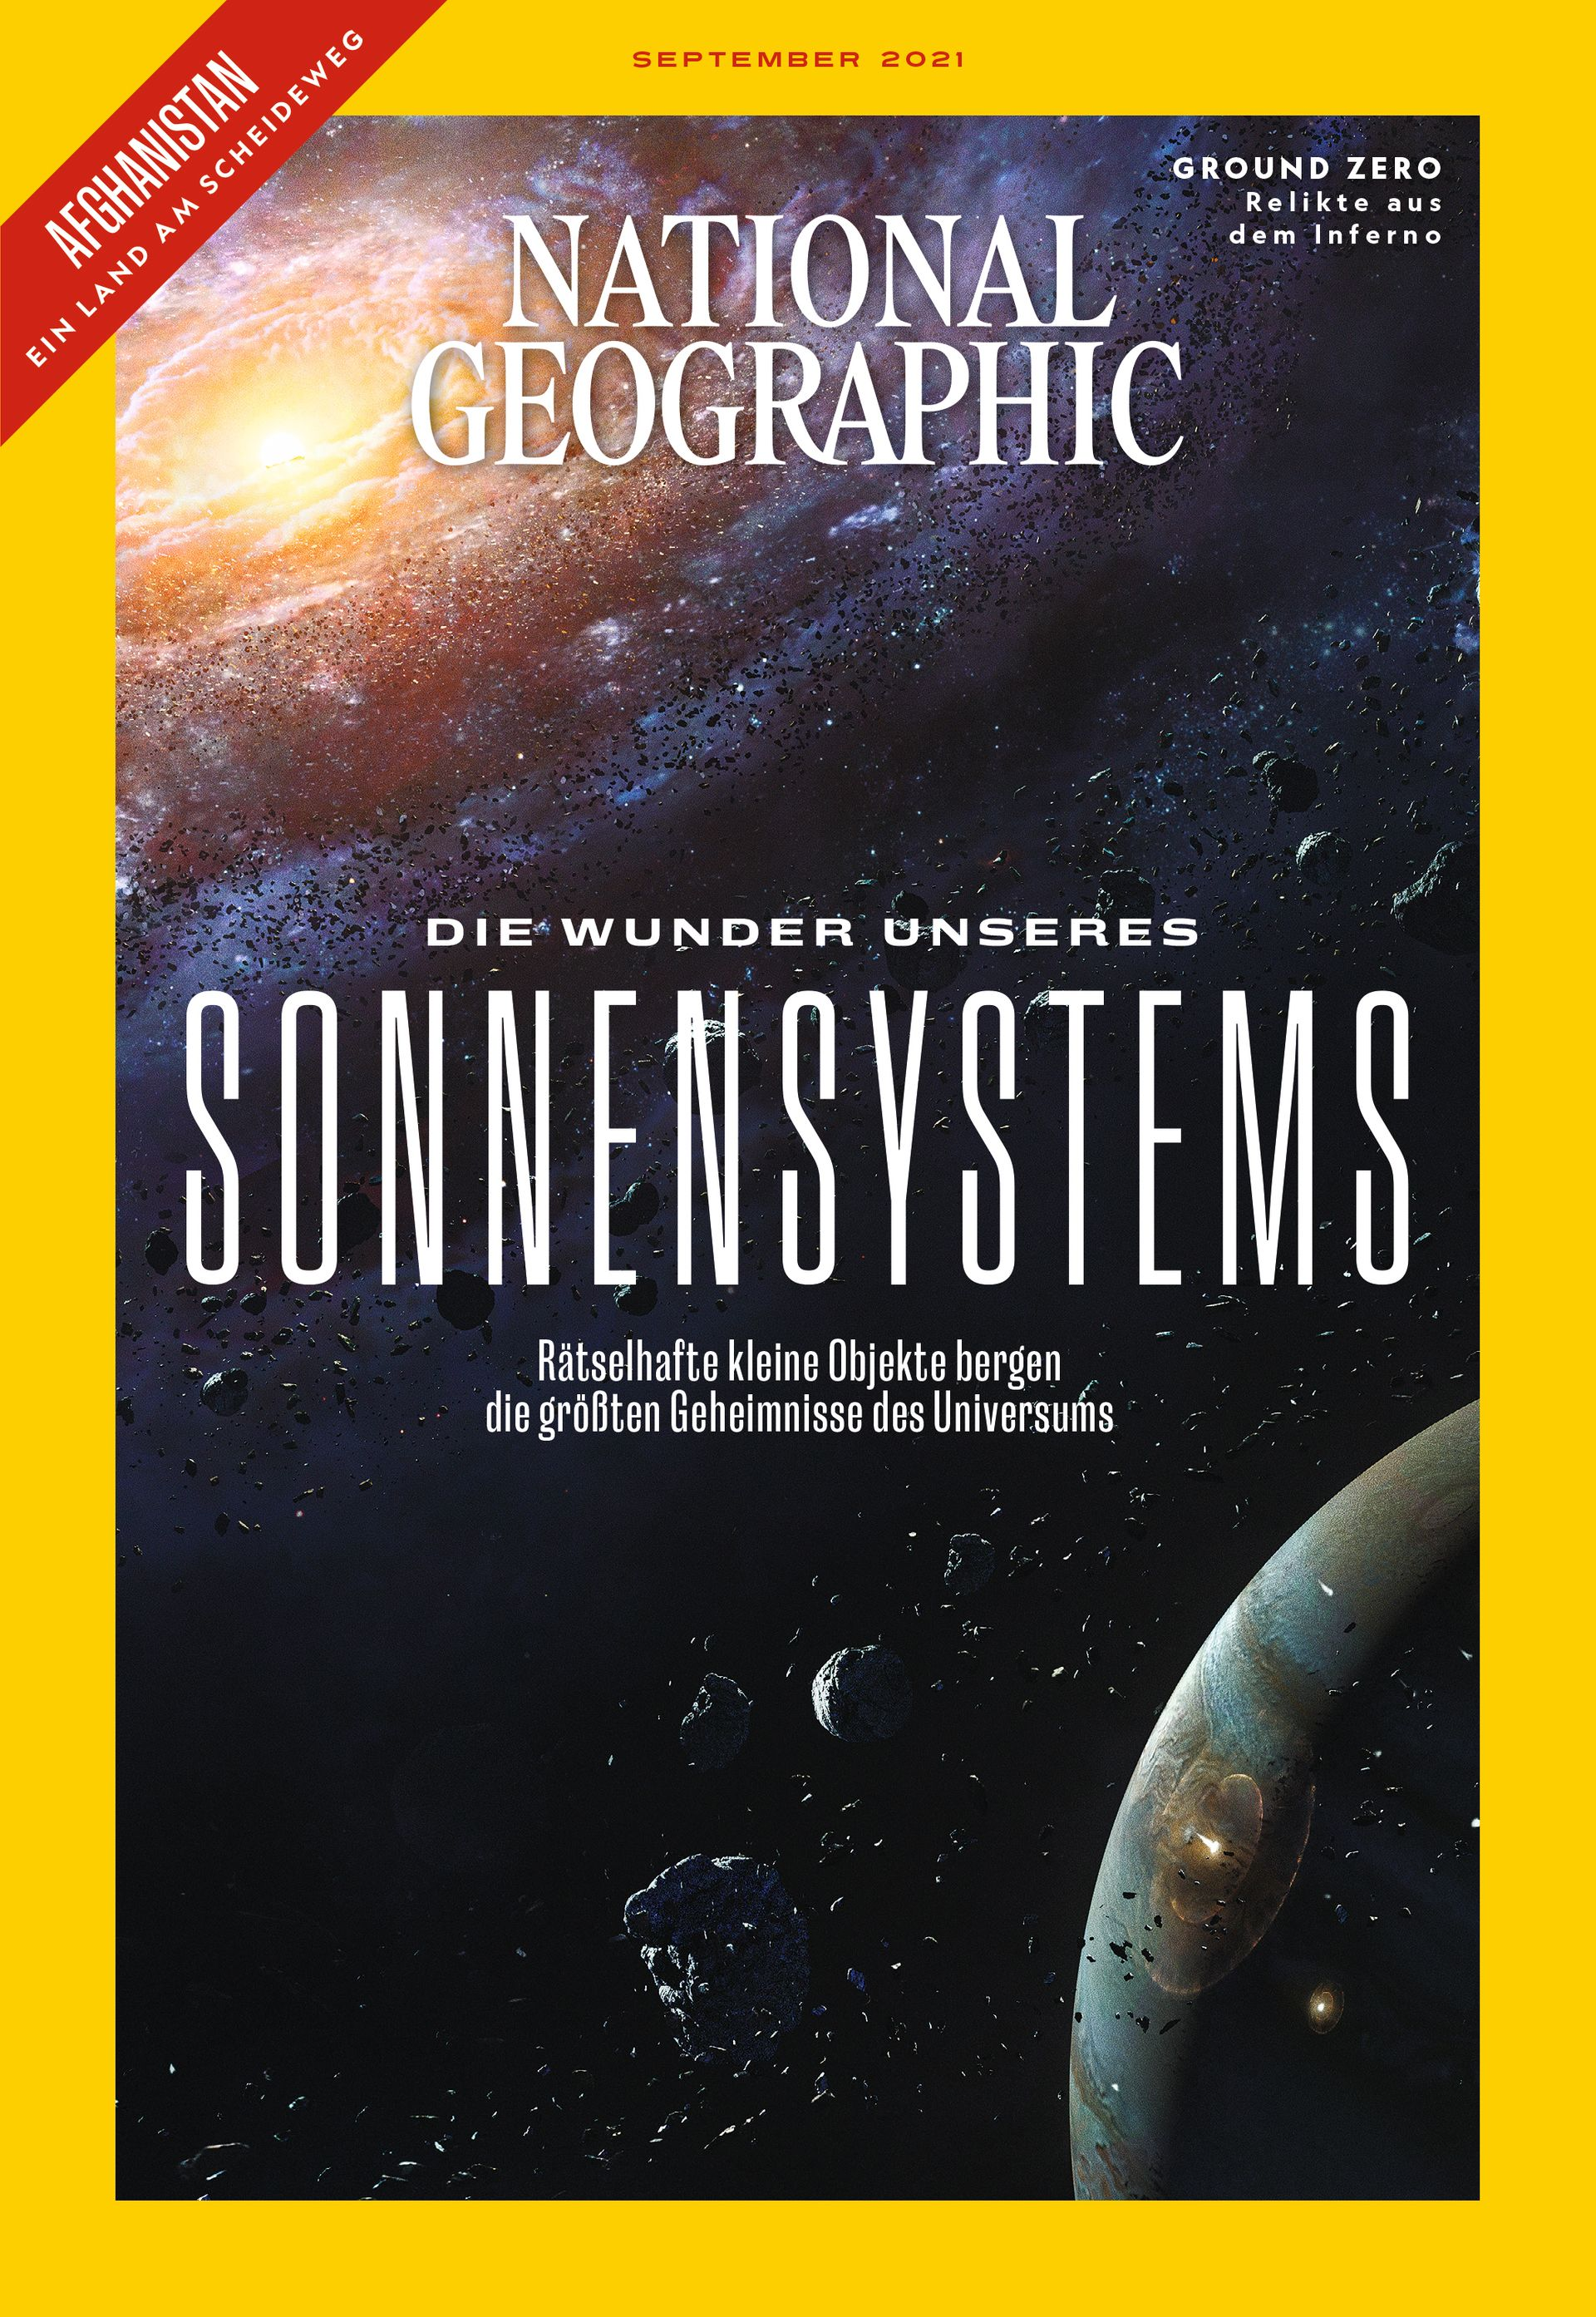 National Geographic Studentenabo